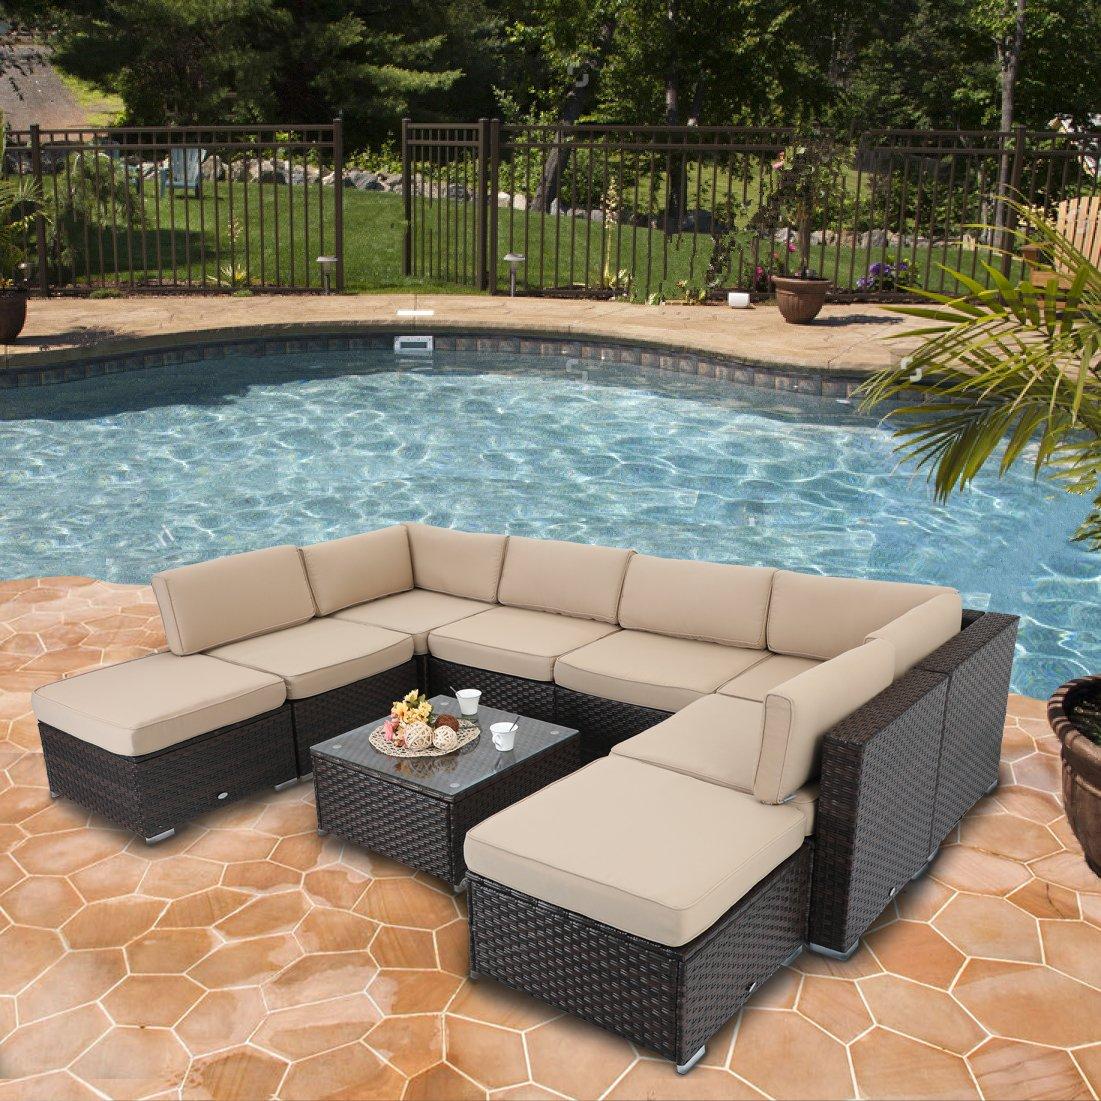 PHI VILLA Outdoor Sofa- Patio Wicker Furniture Set 9-Piece, Beige